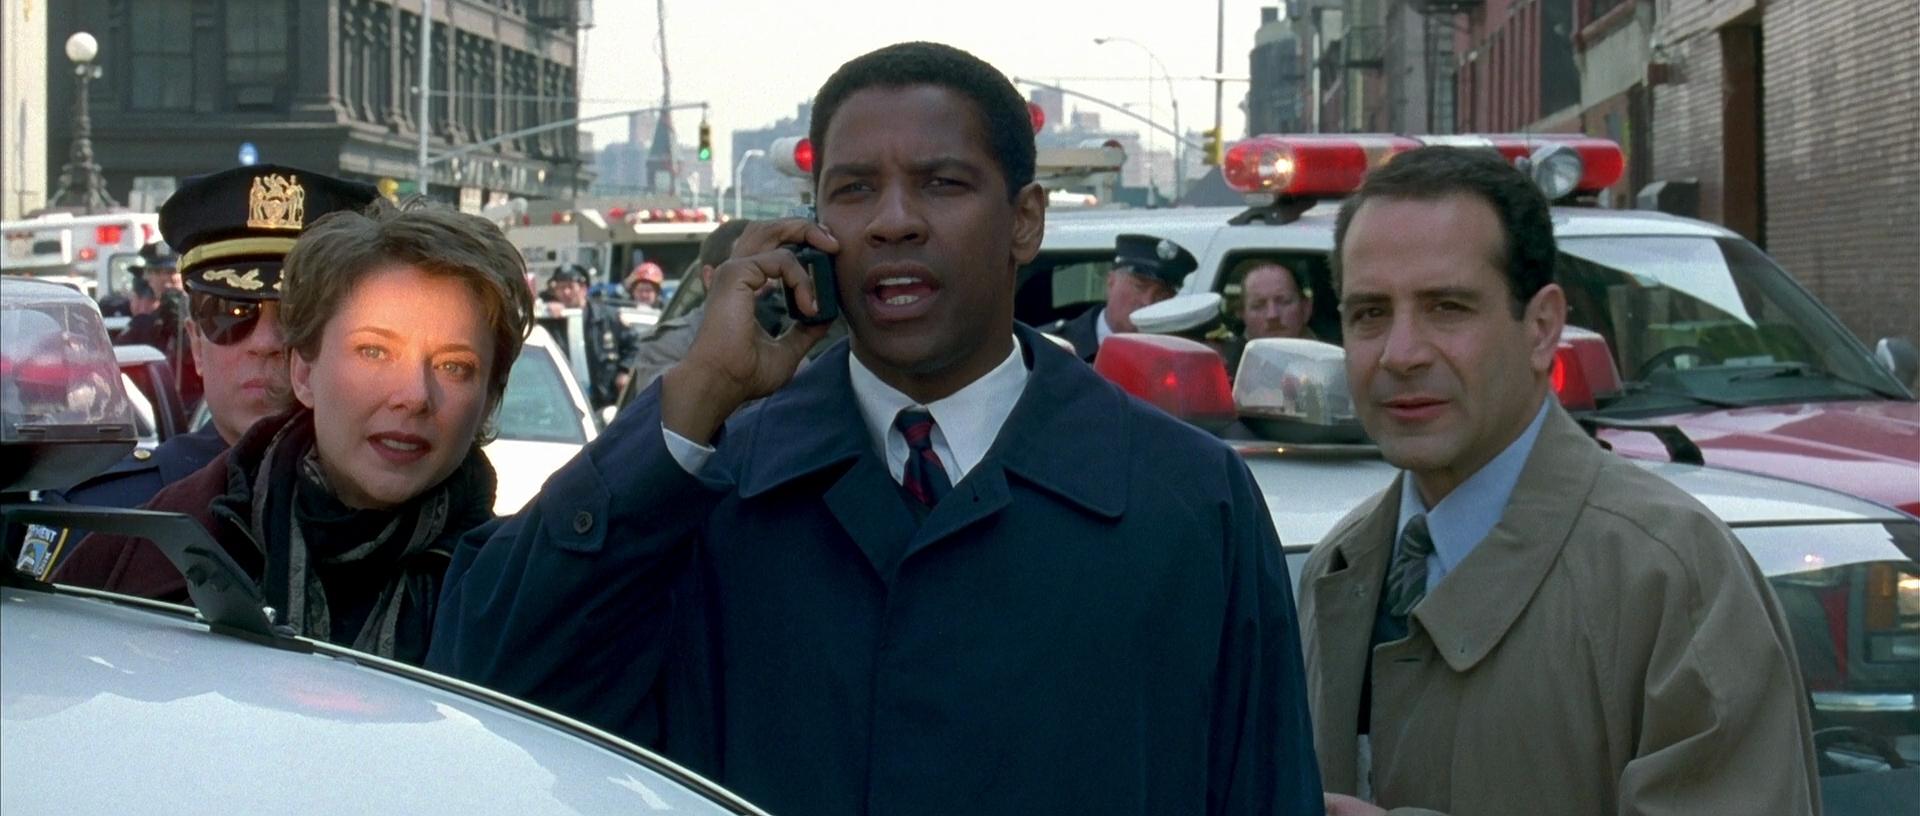 Annette Bening, Denzel Washington and Tony Shalhoub in The Siege